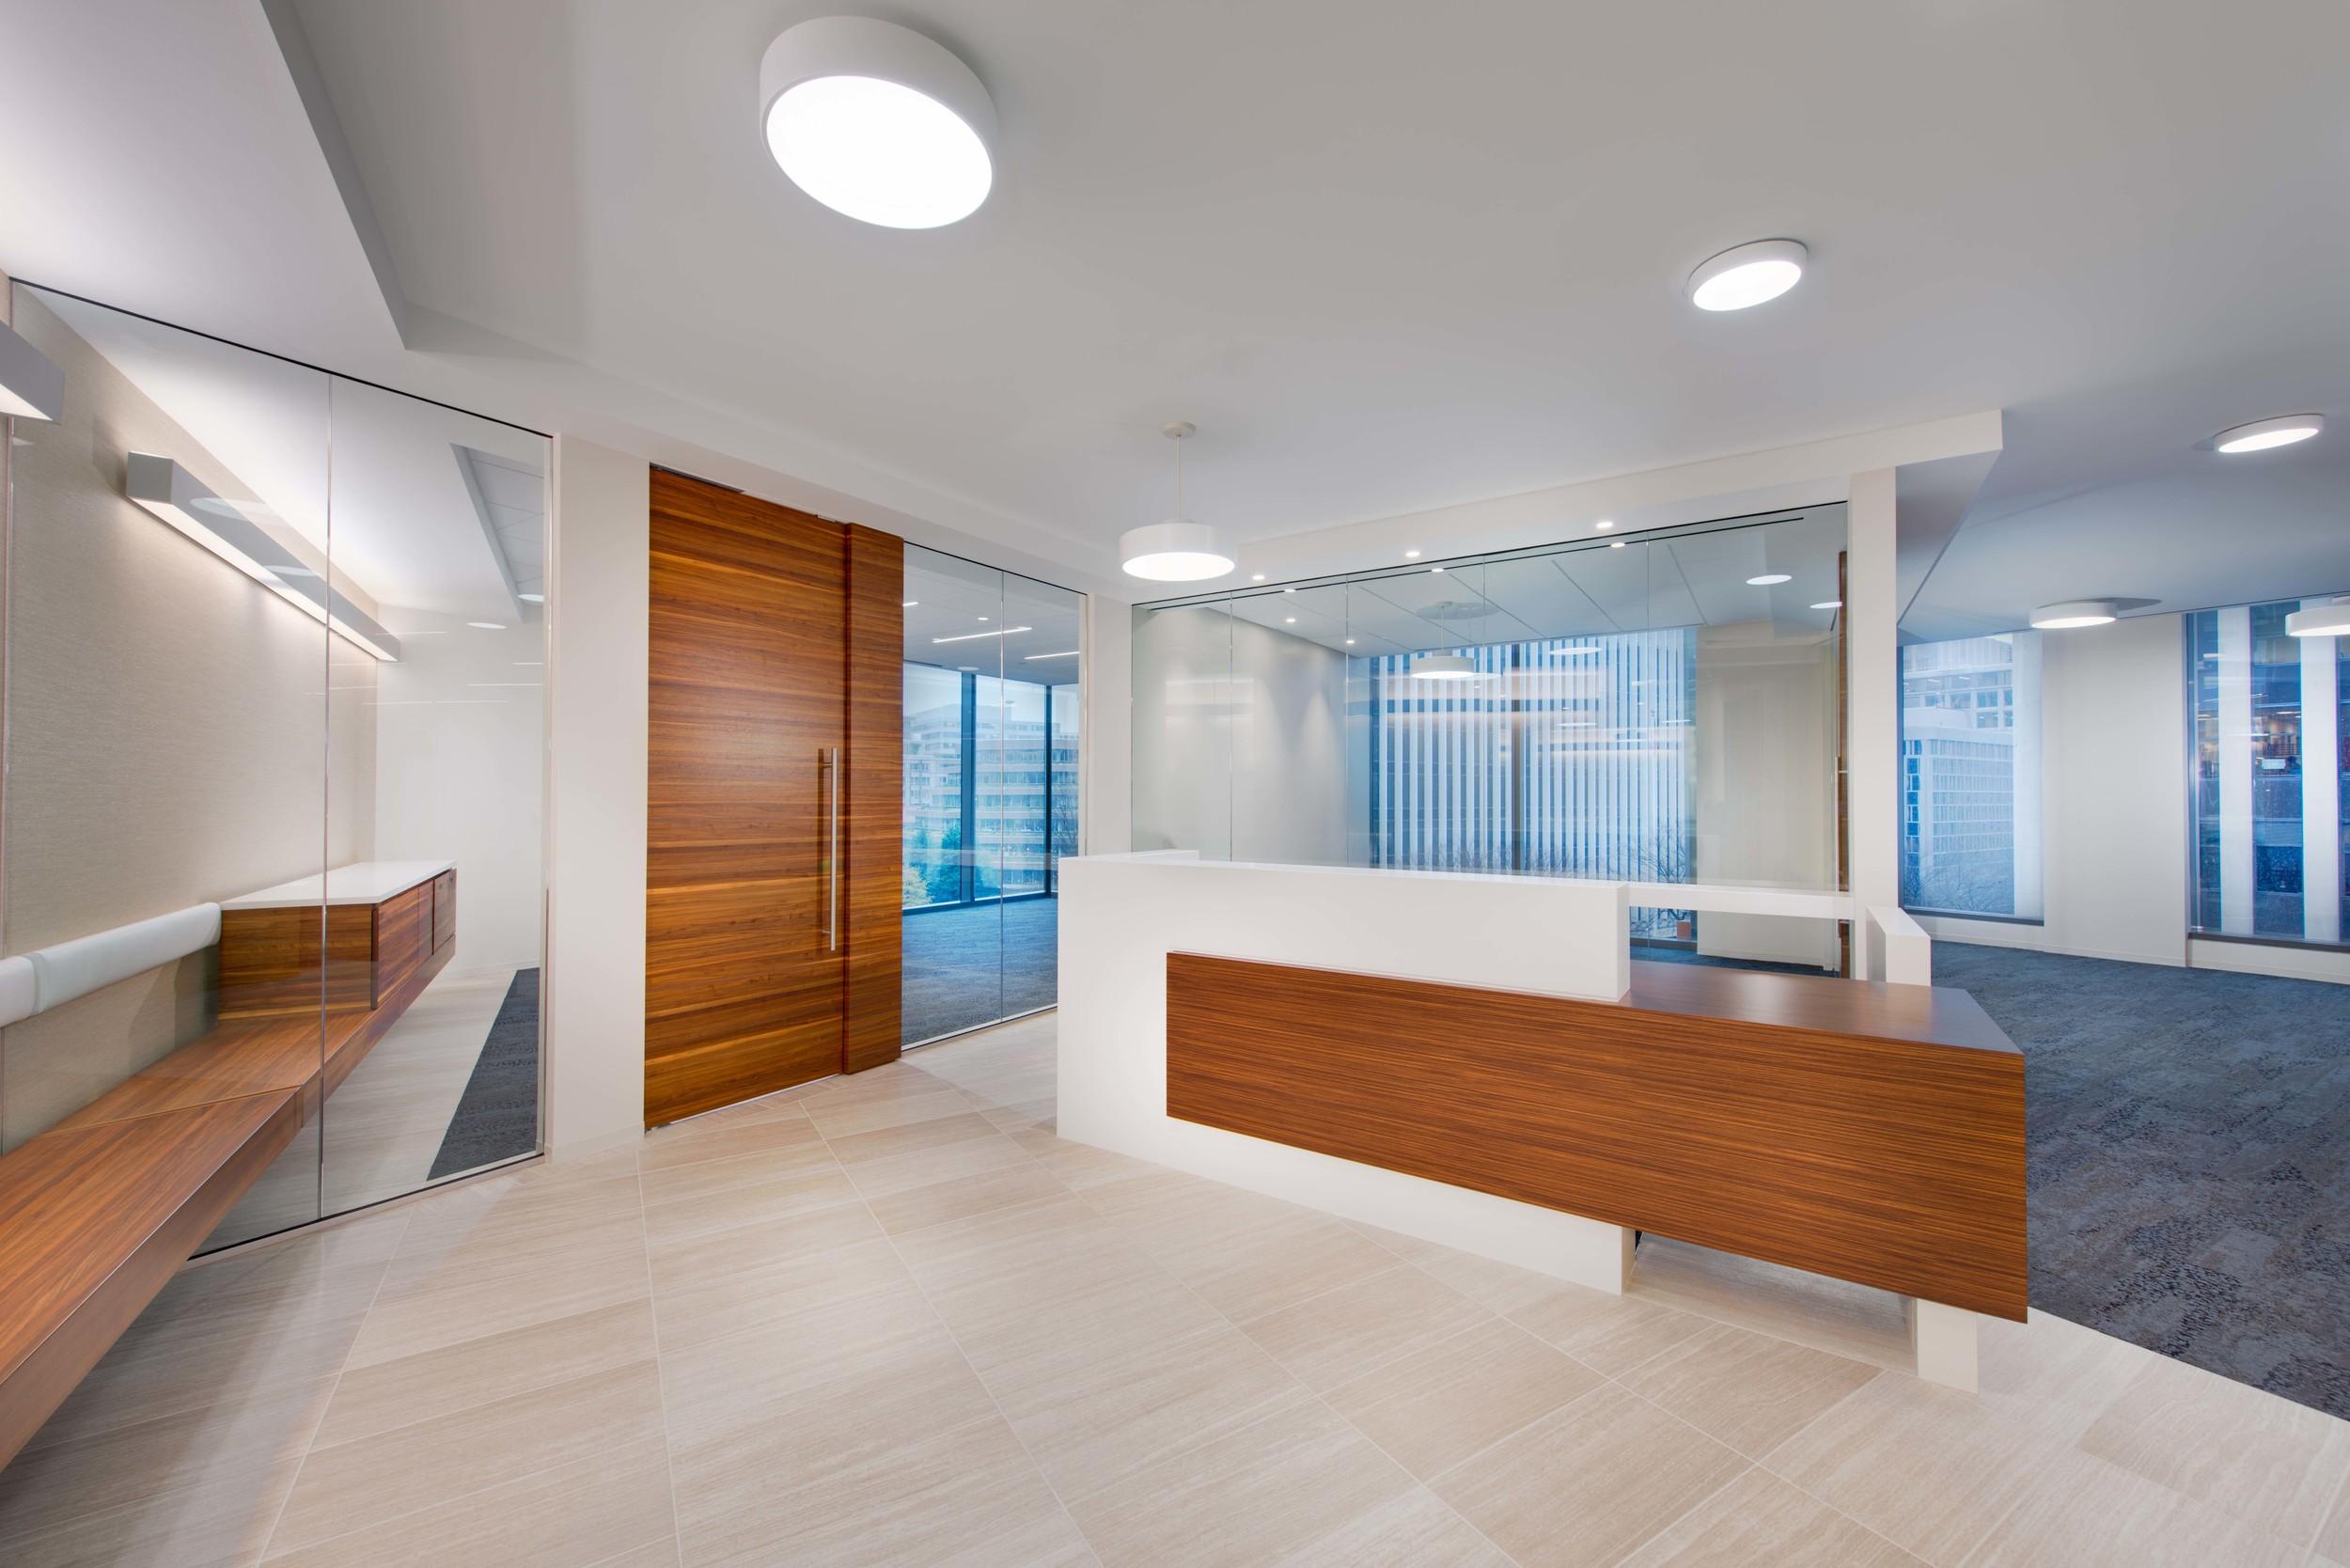 1200 17th Office Suite Interior Image 216263.jpg